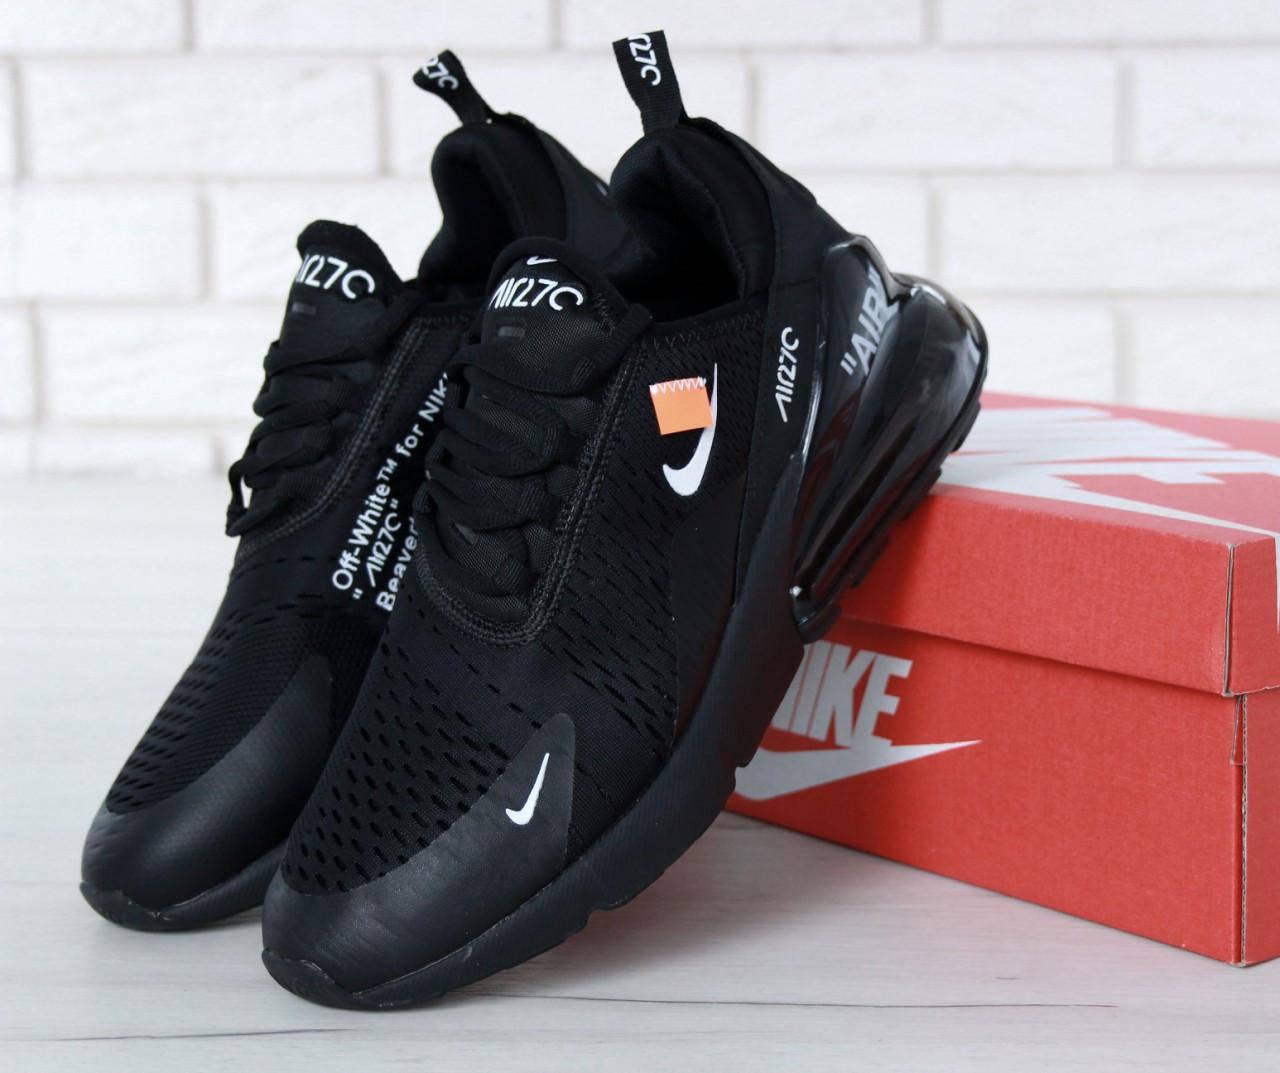 778b9a56 Мужские кроссовки Nike Air Max 270 x Off-White x Full Black - Магазин  стильной